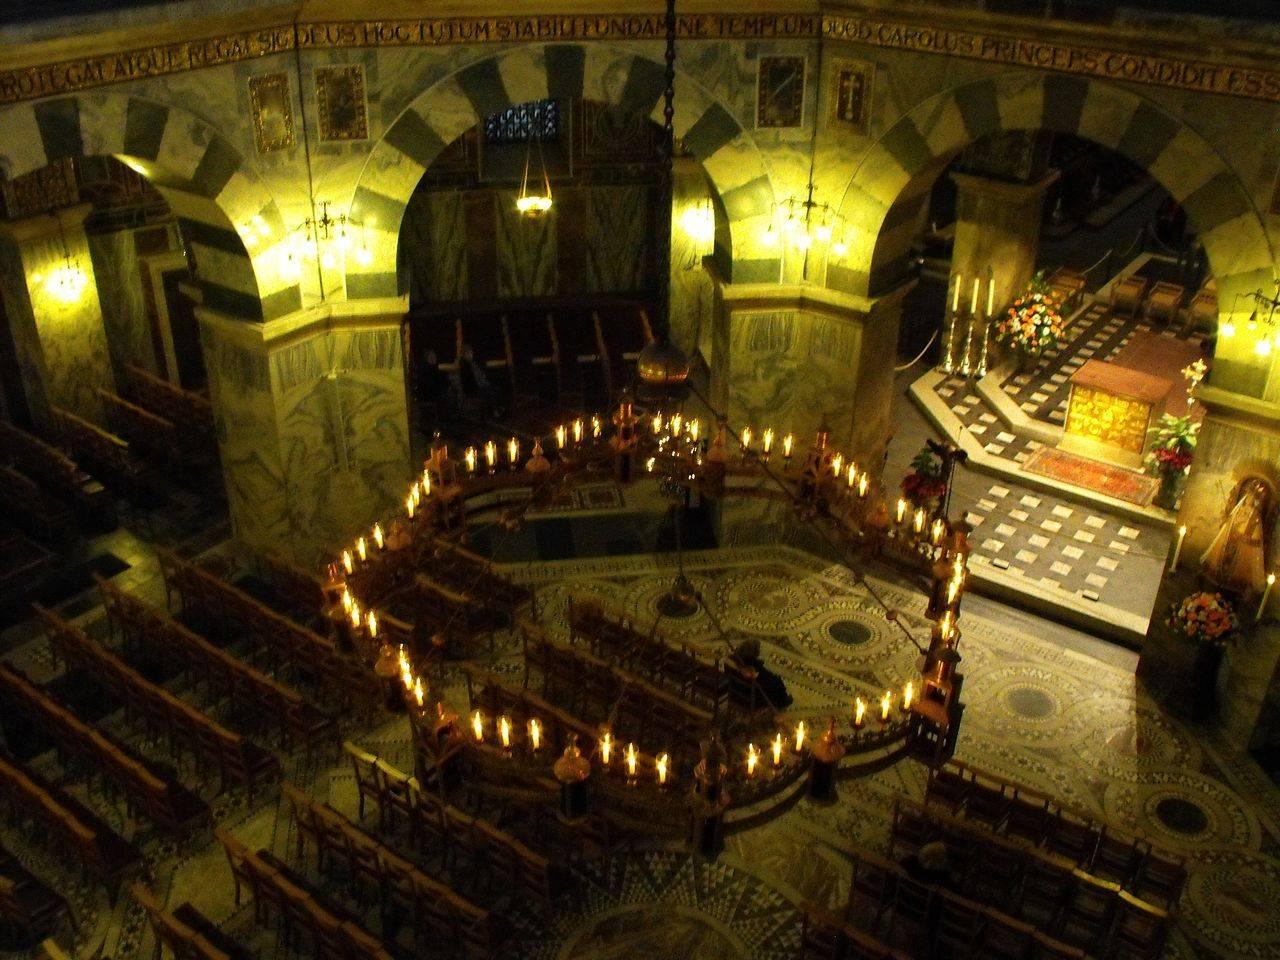 Великий дворец великого карла в ахене